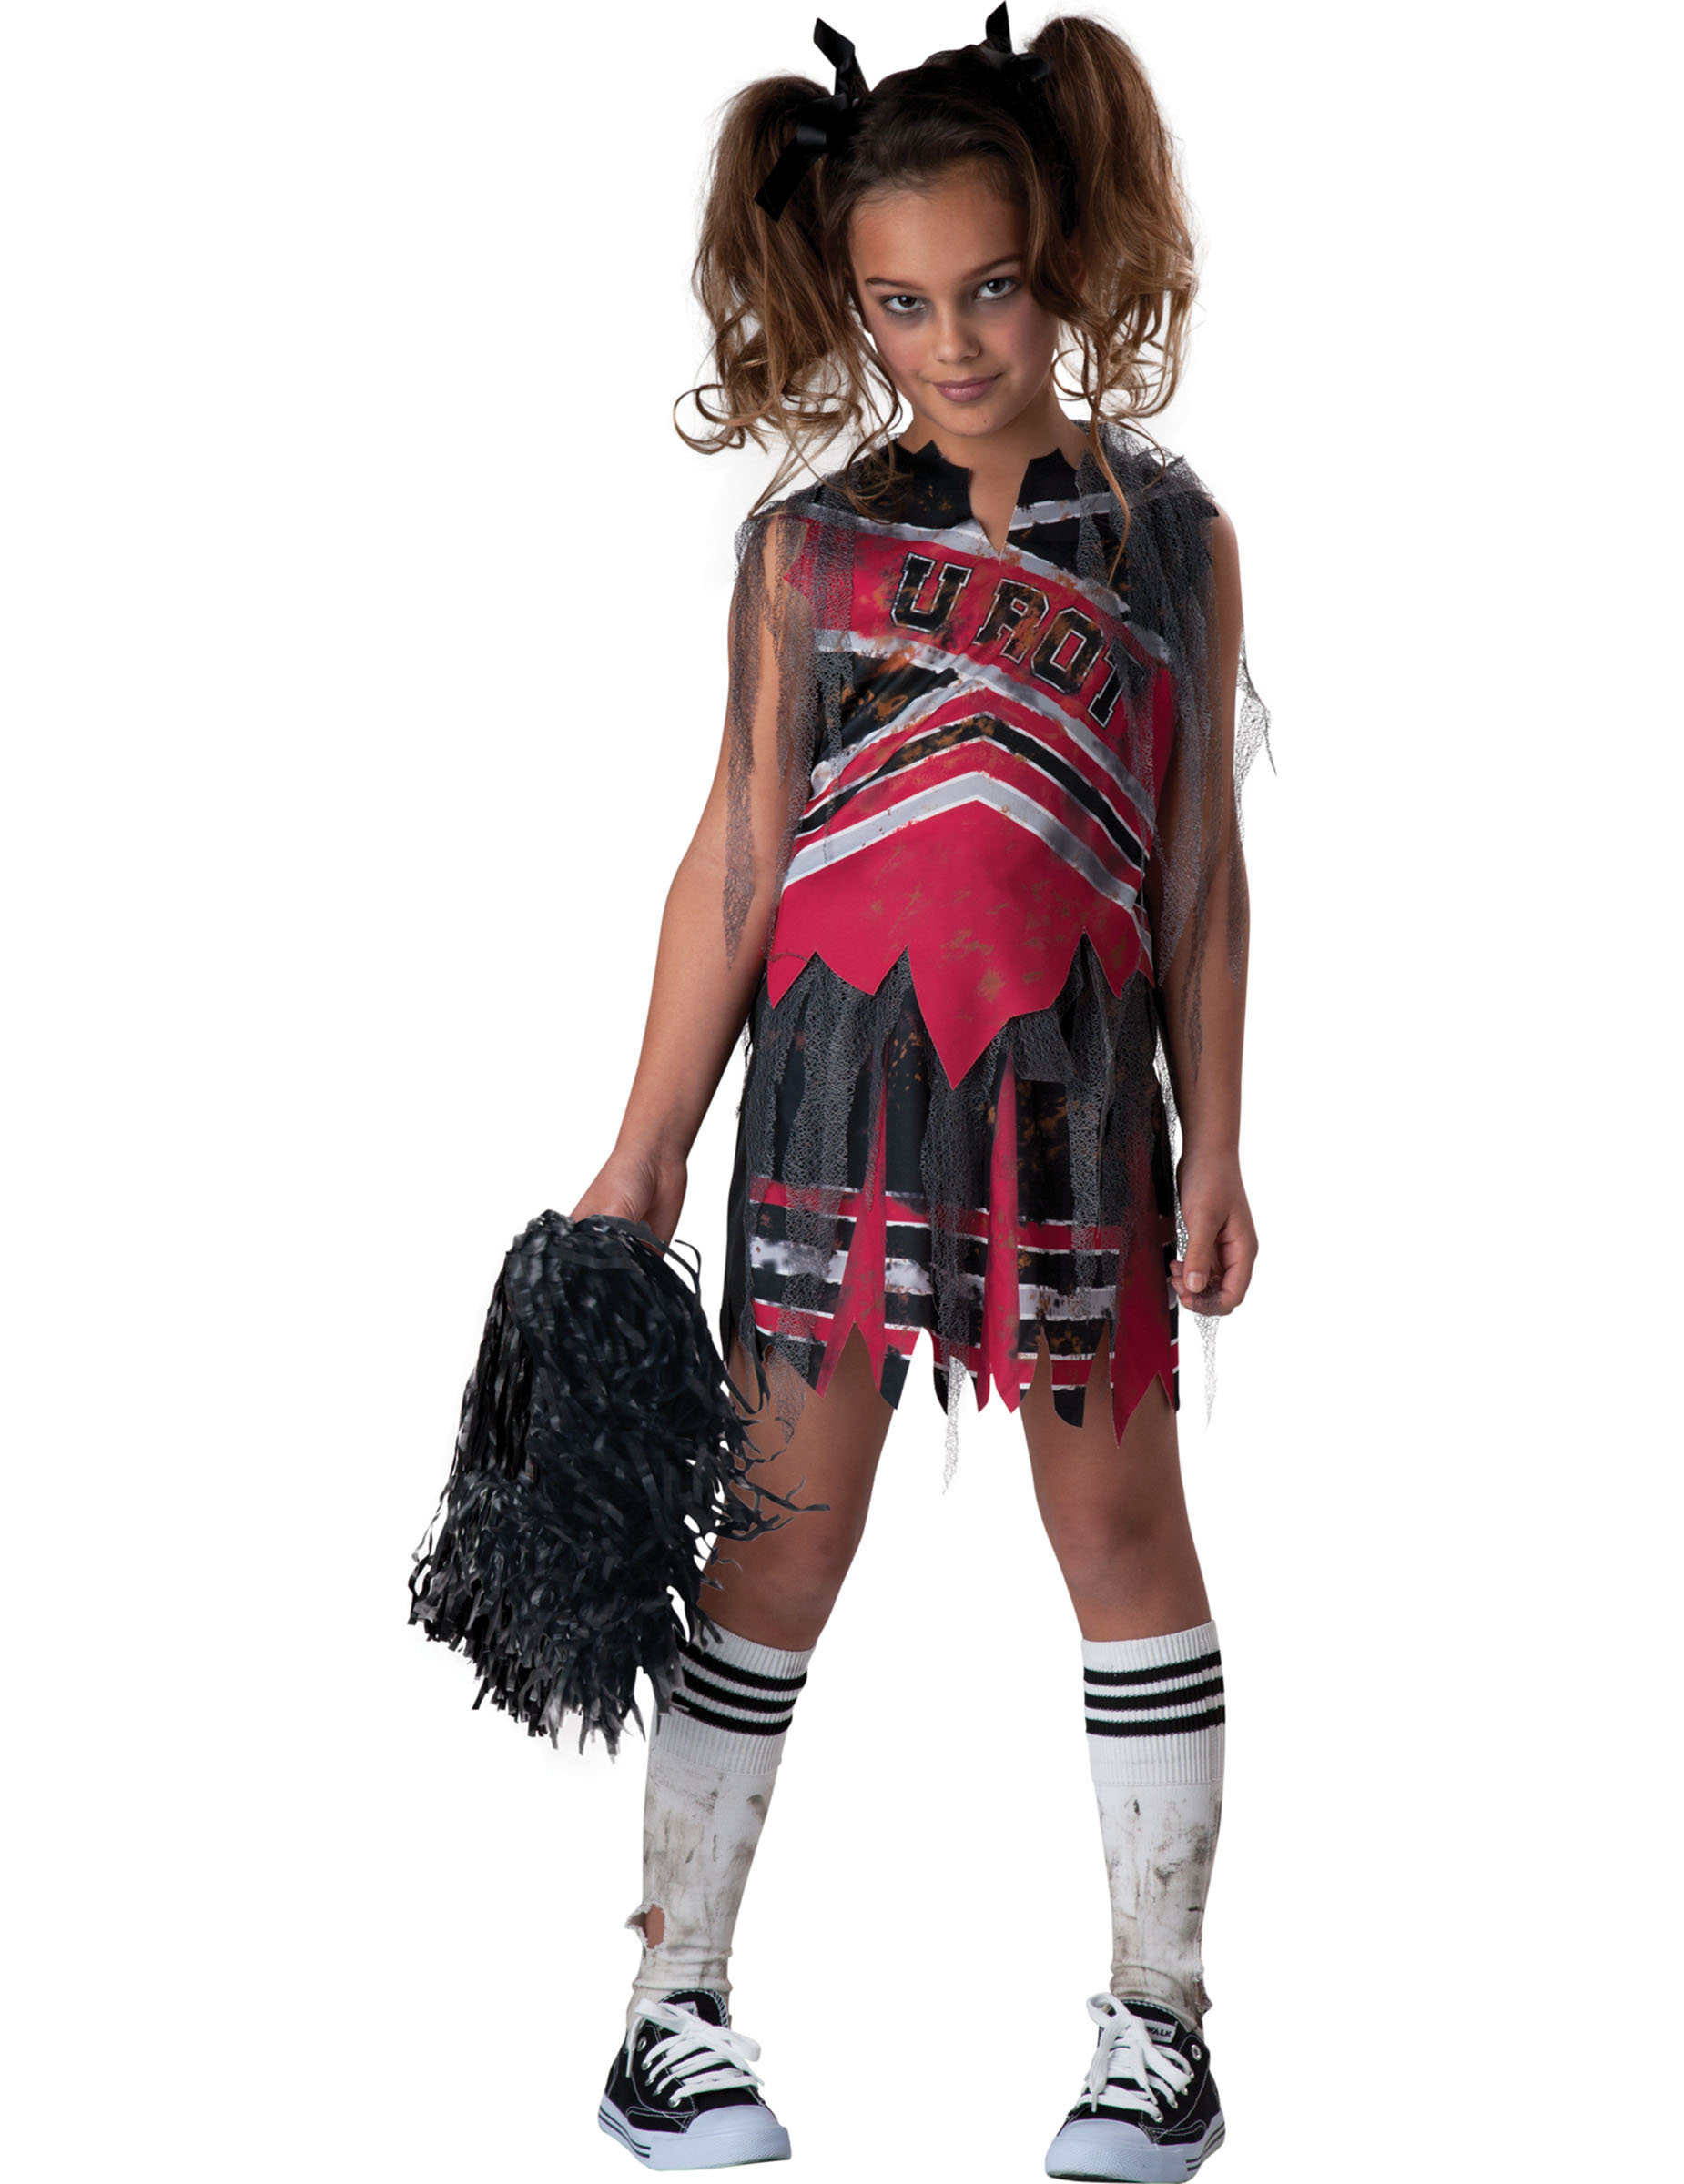 zombie cheerleader kost m f r m dchen kost me f r kinder und g nstige faschingskost me vegaoo. Black Bedroom Furniture Sets. Home Design Ideas